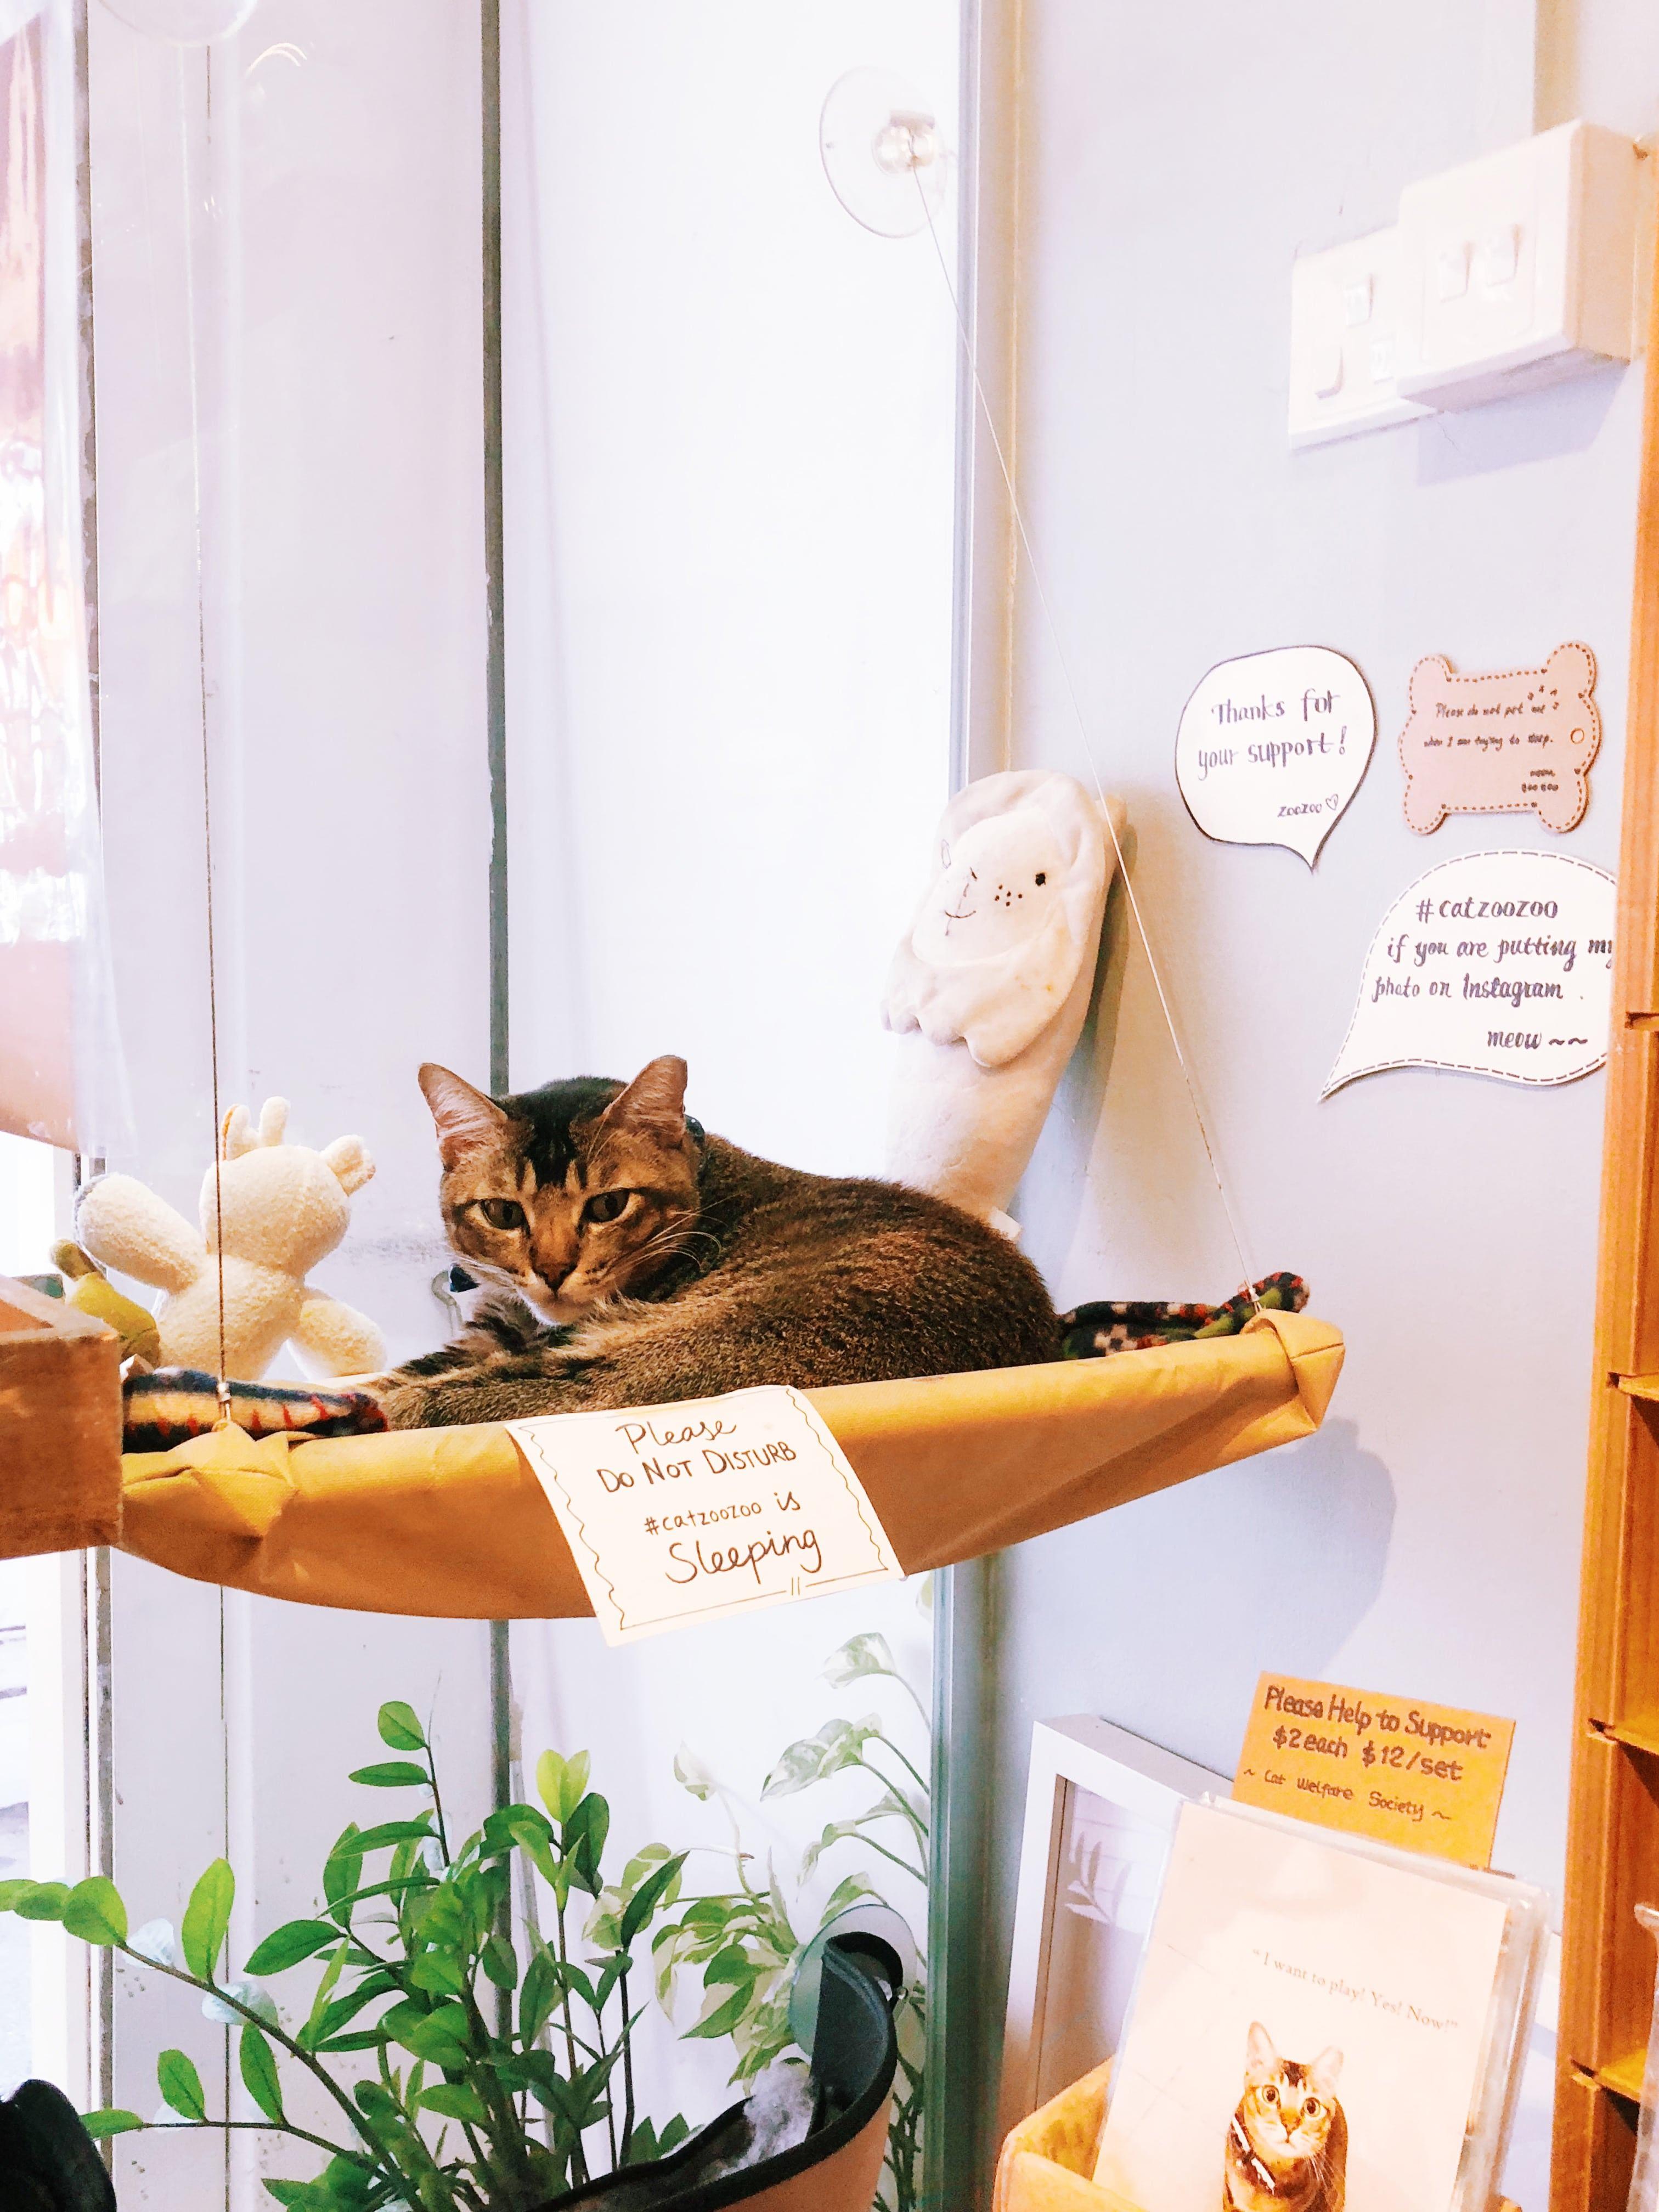 chú mèo tại cat socrate